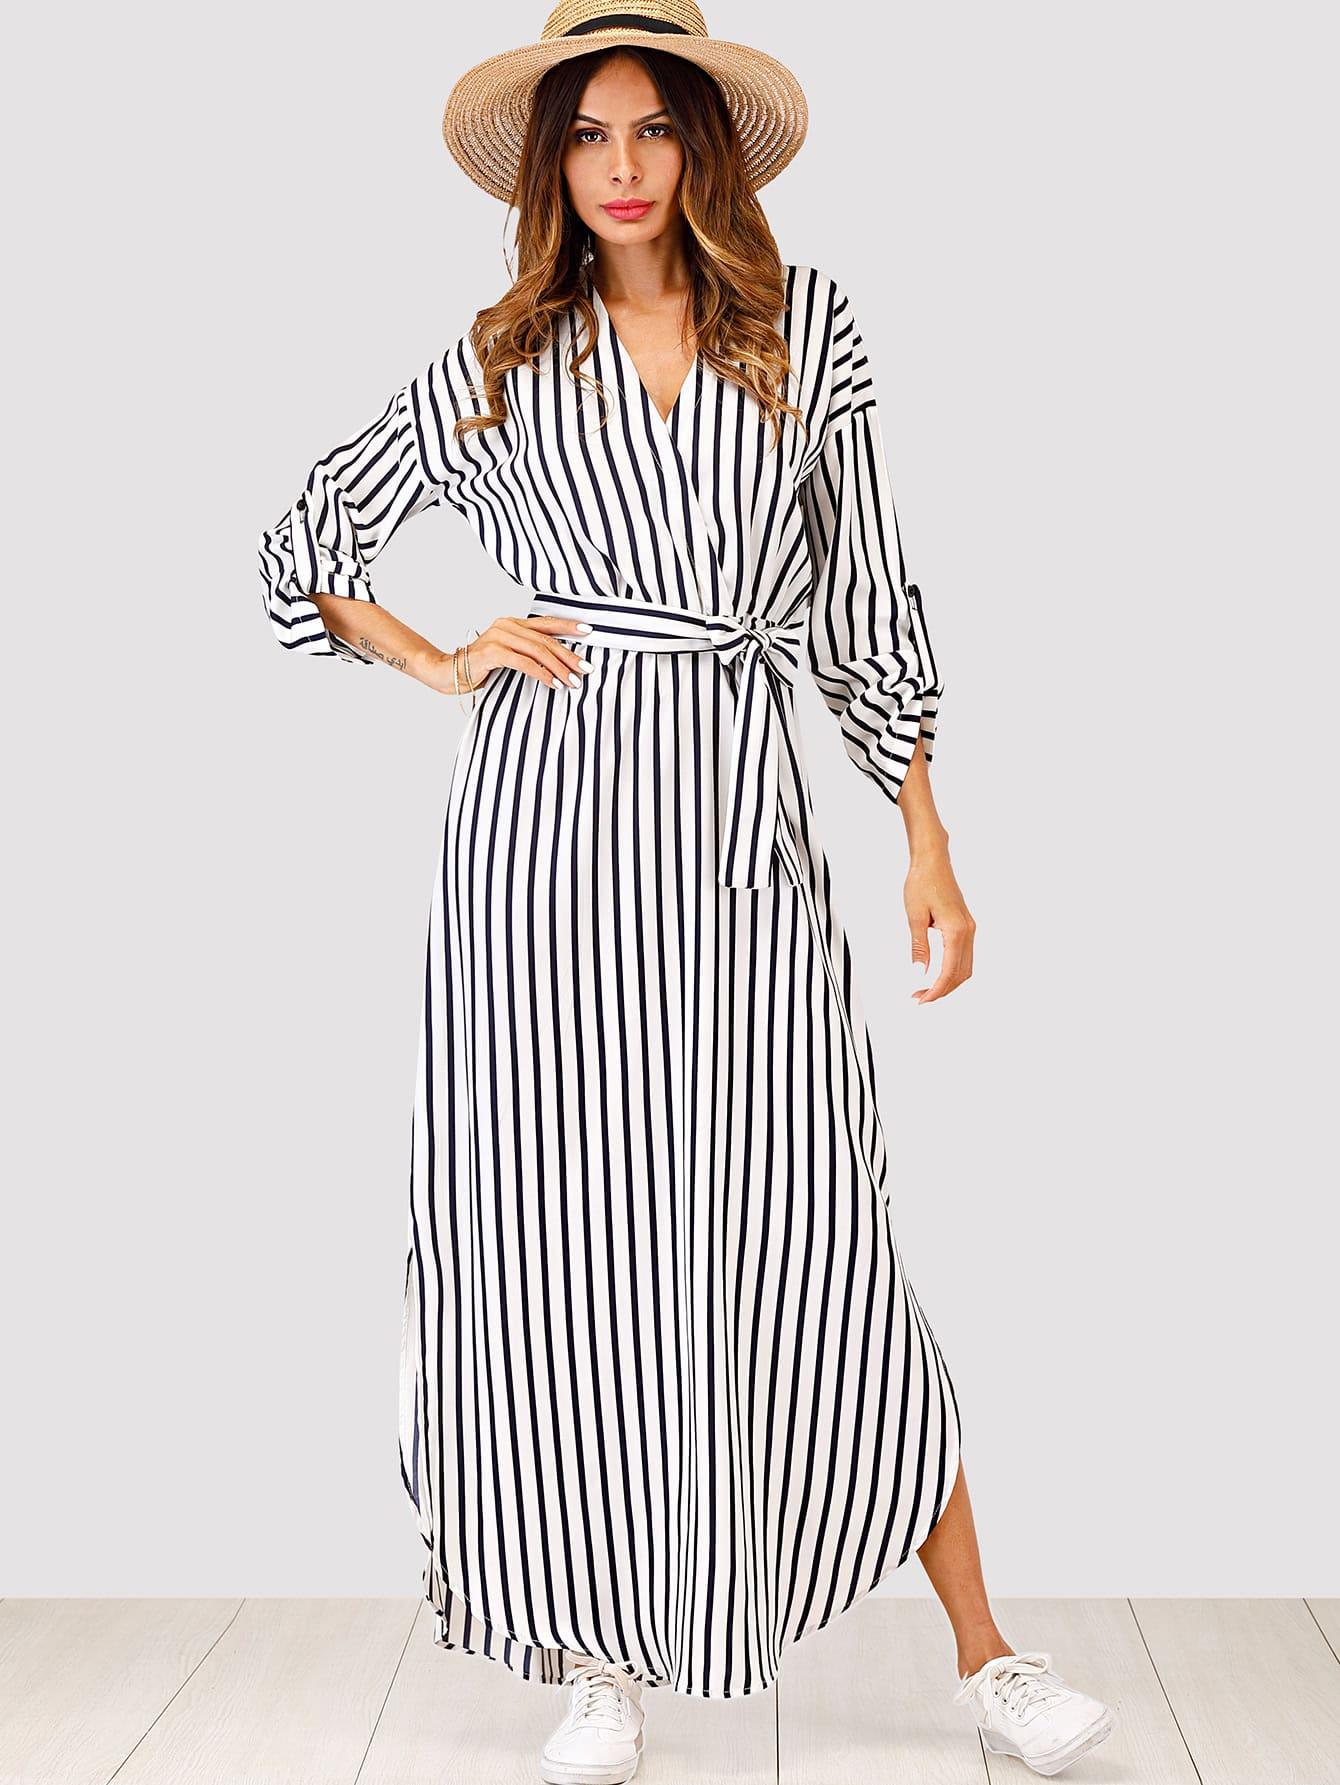 Striped Self Tie Waist Dress striped ruffled waist self tie pants